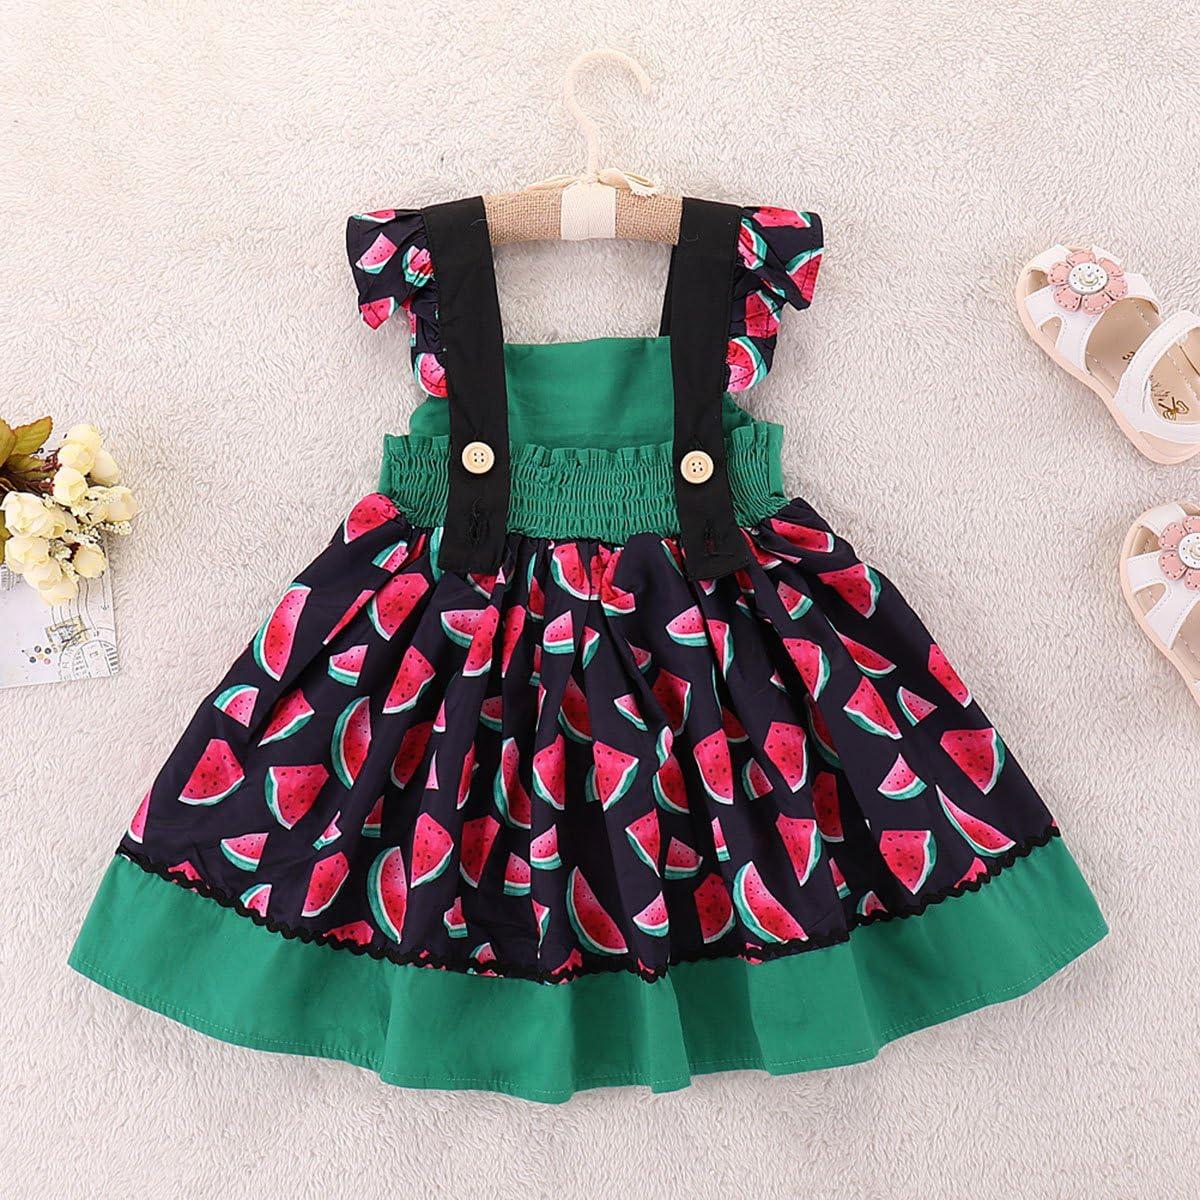 Camidy Baby Toddler Girl Summer Dress Ruffle Sleeve Watermelon Print Bowknot Sundress